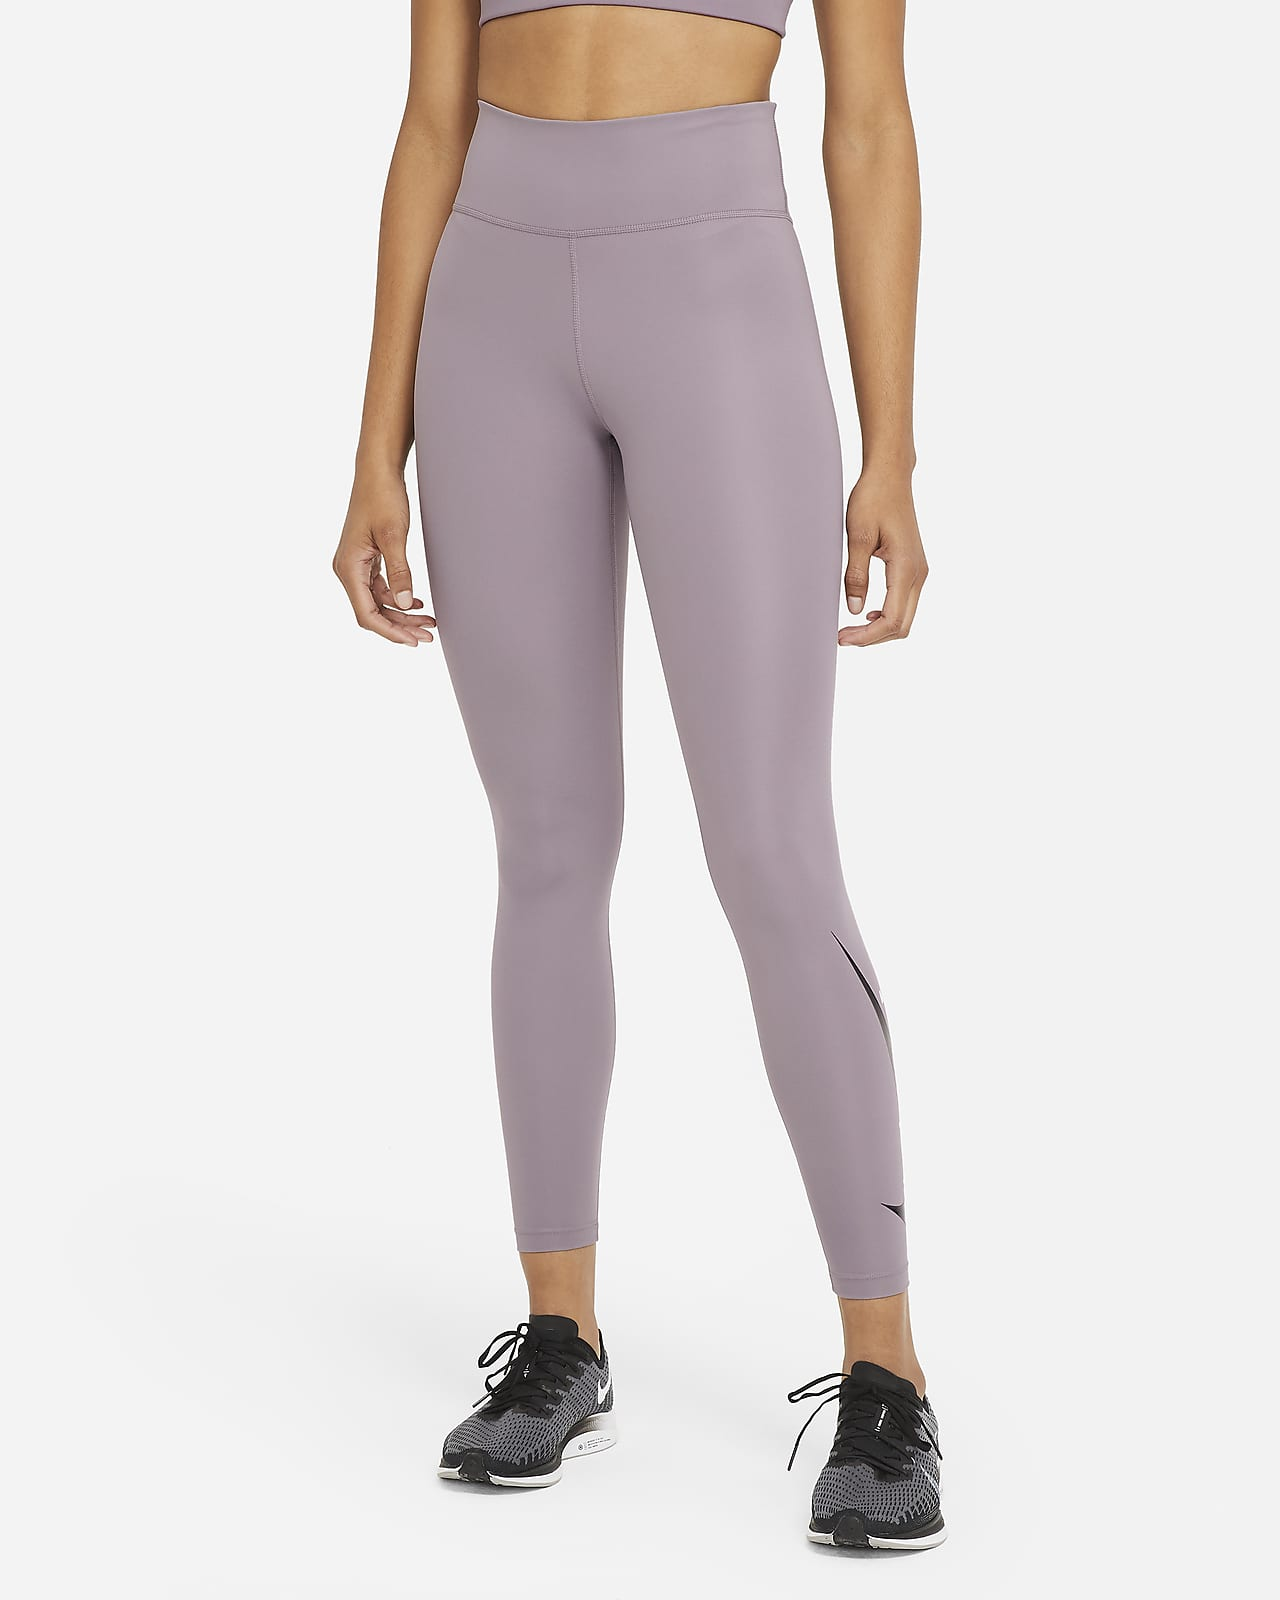 Nike Swoosh Run 女款中腰跑步九分內搭褲